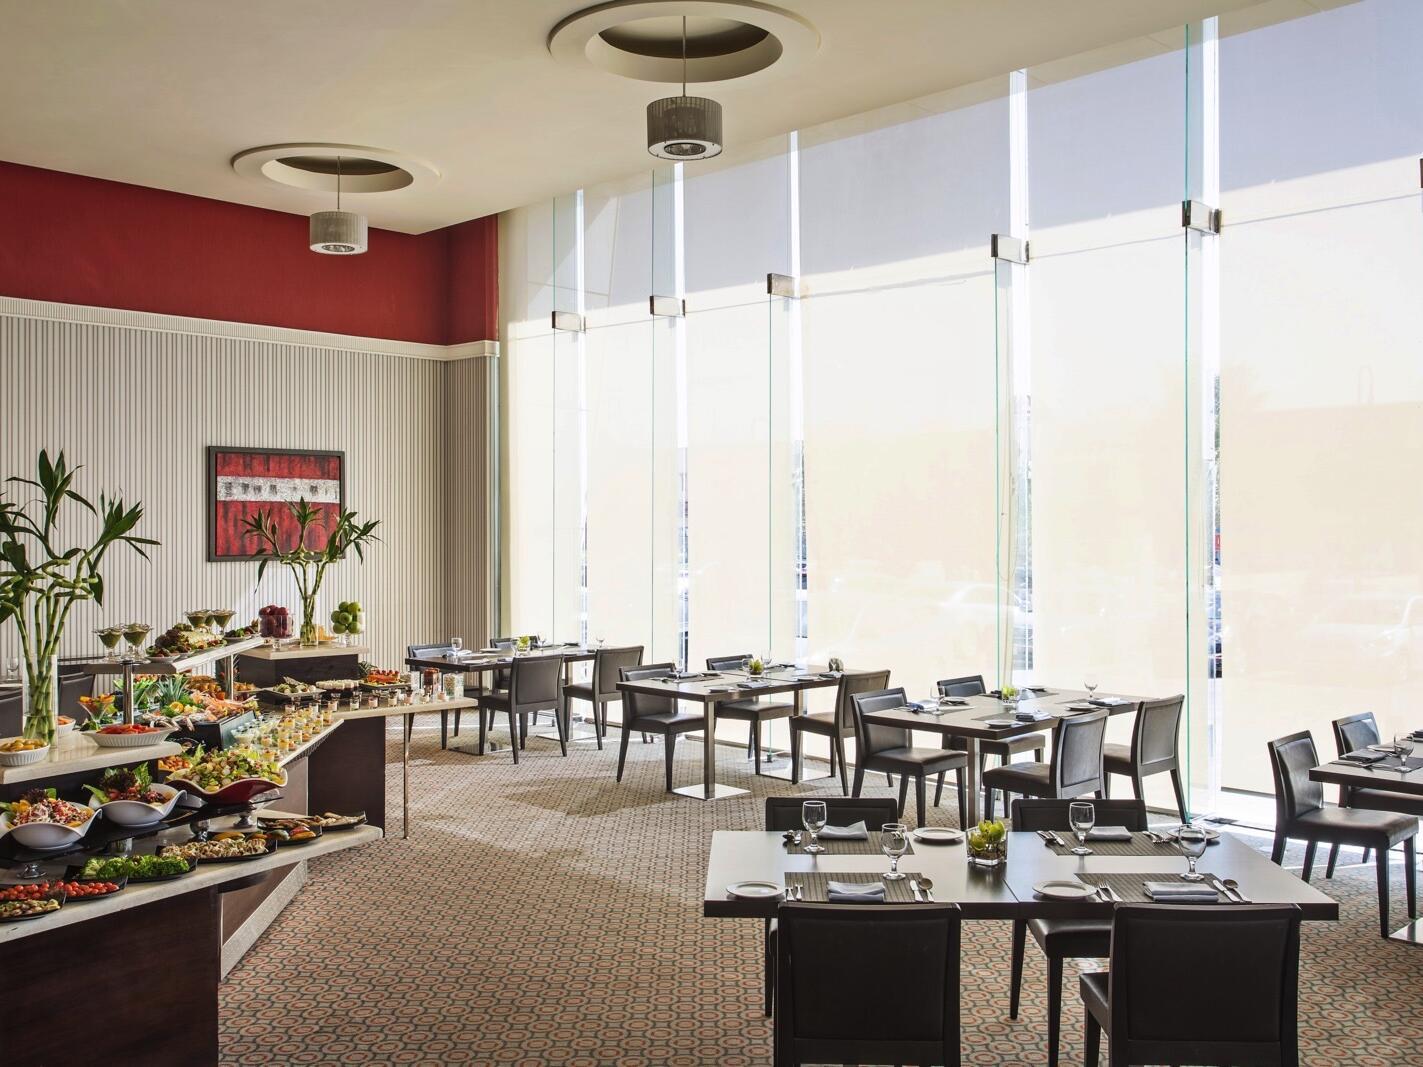 Restaurant at RAND by Wandalus in Riyadh